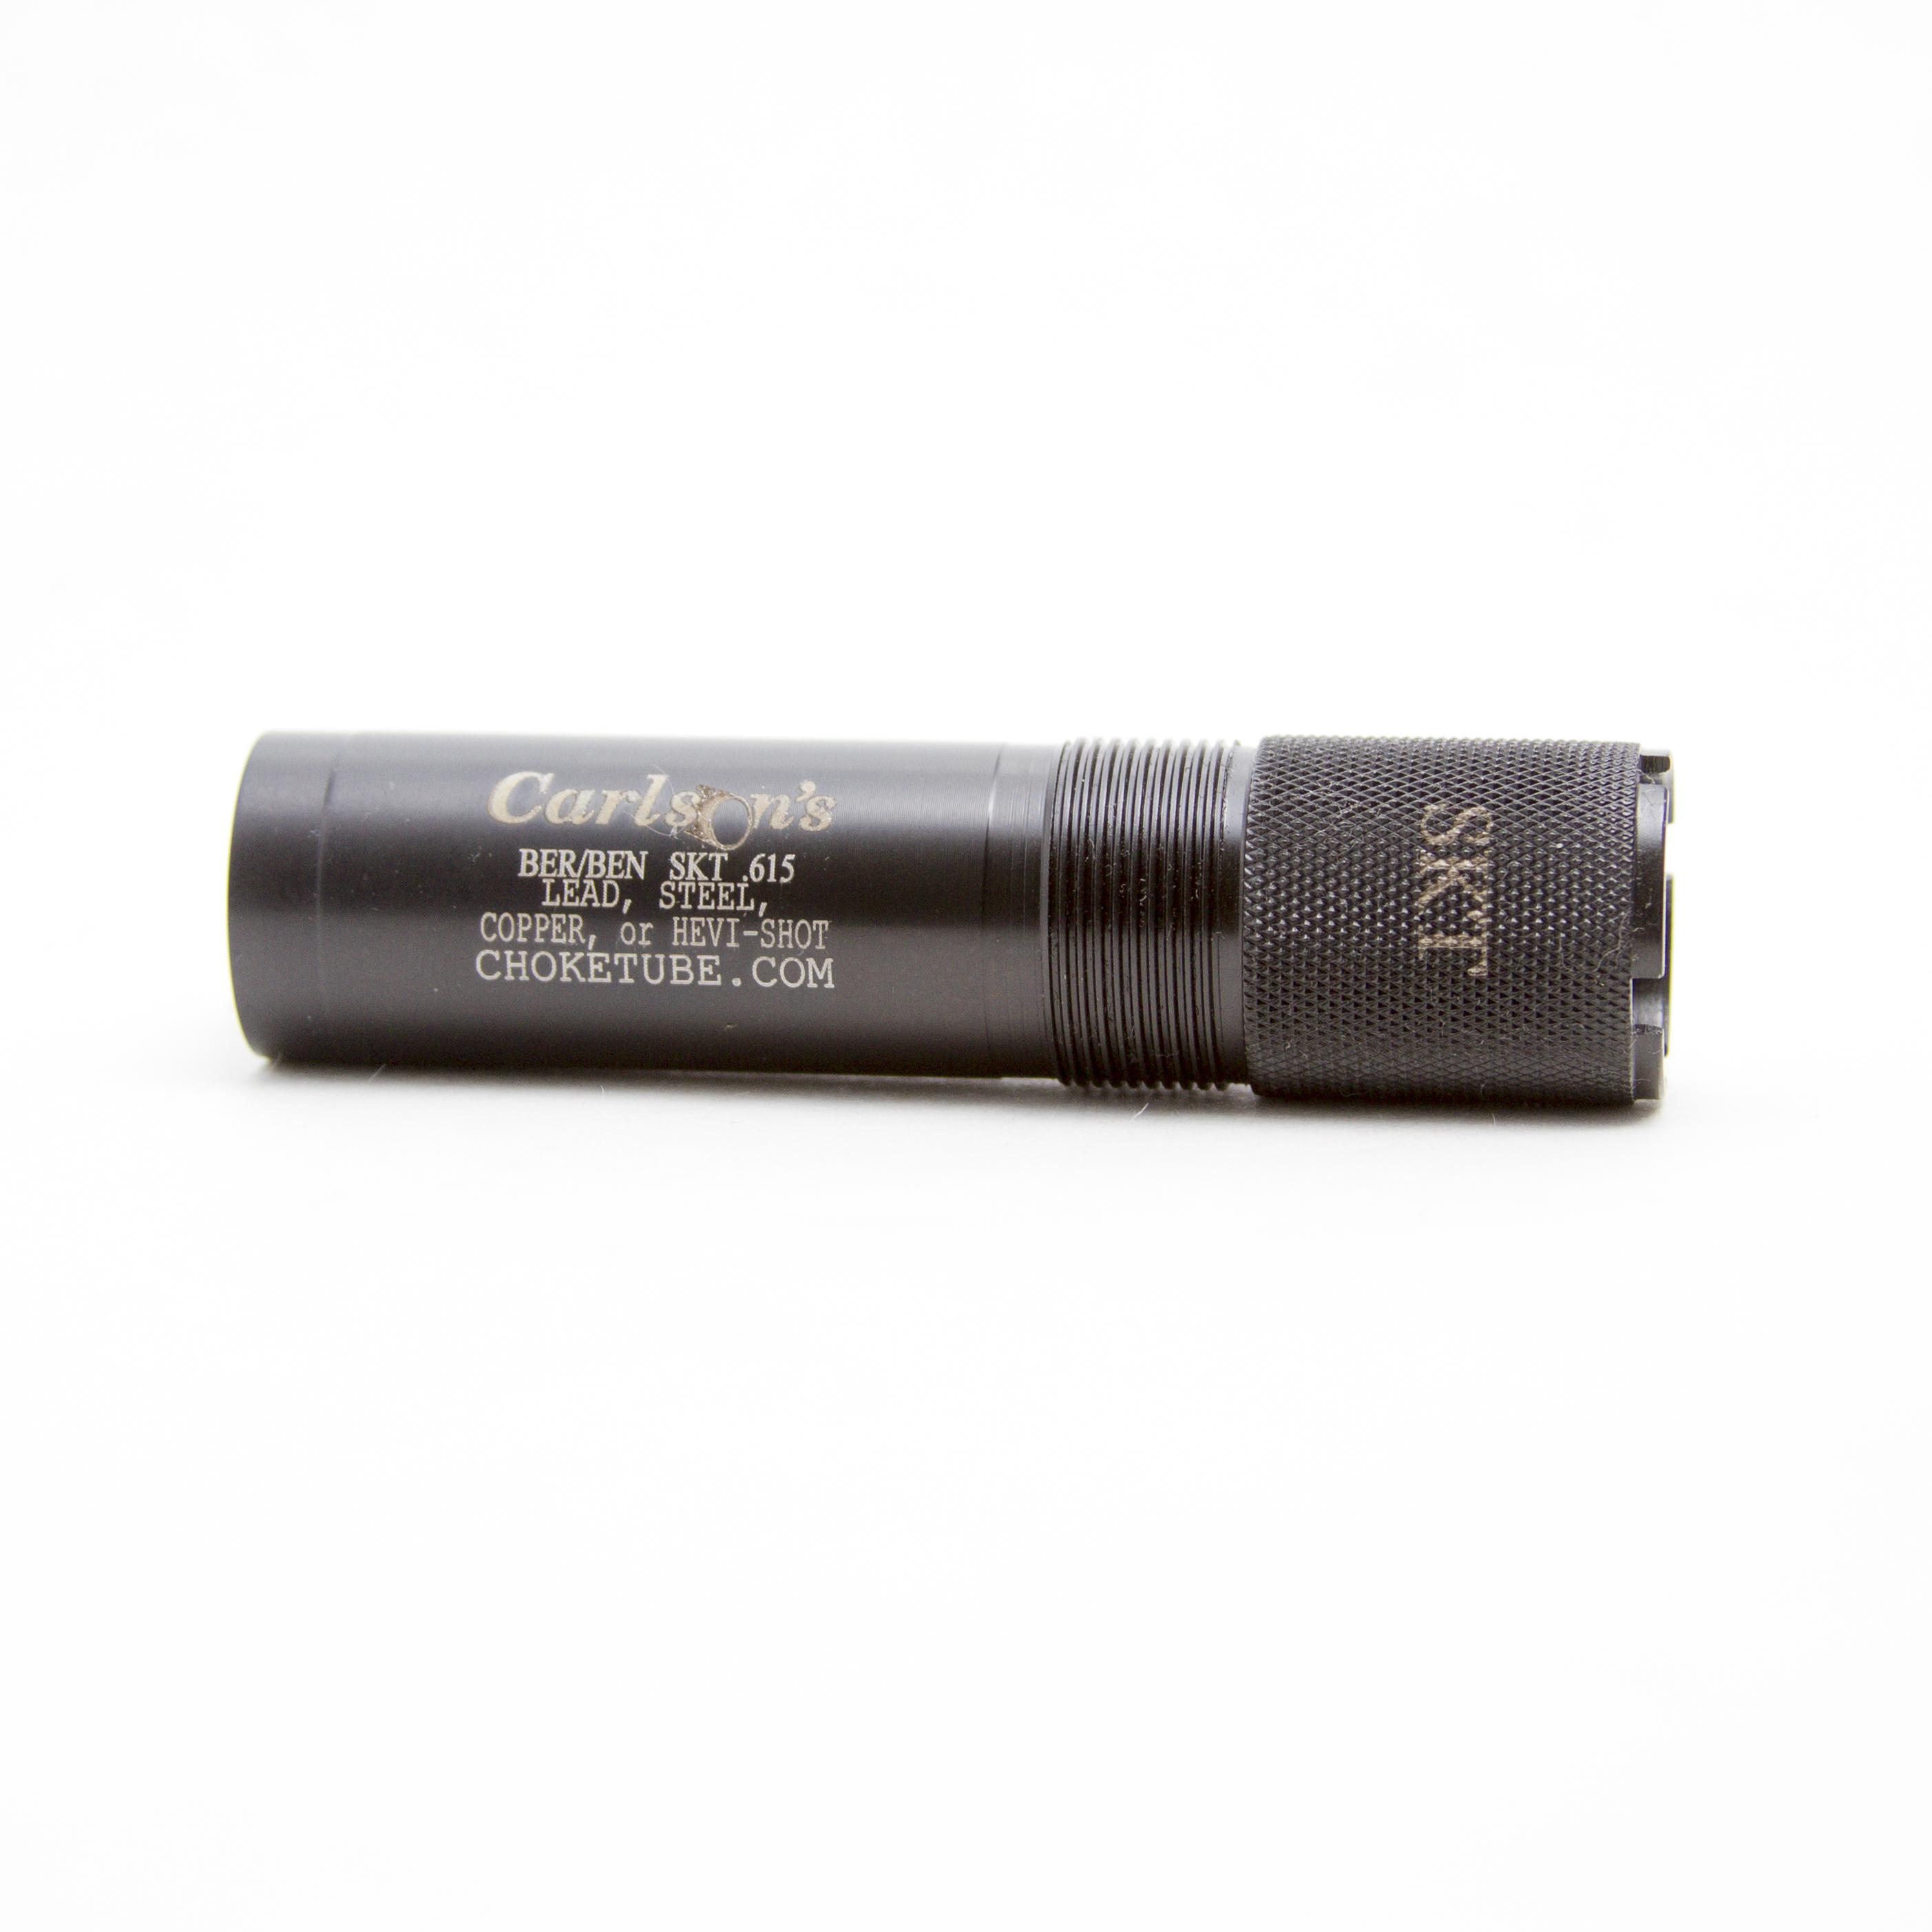 Carlson's Choke Tubes Beretta/Benelli Mobil 20ga Black Sporting Clay Skeet